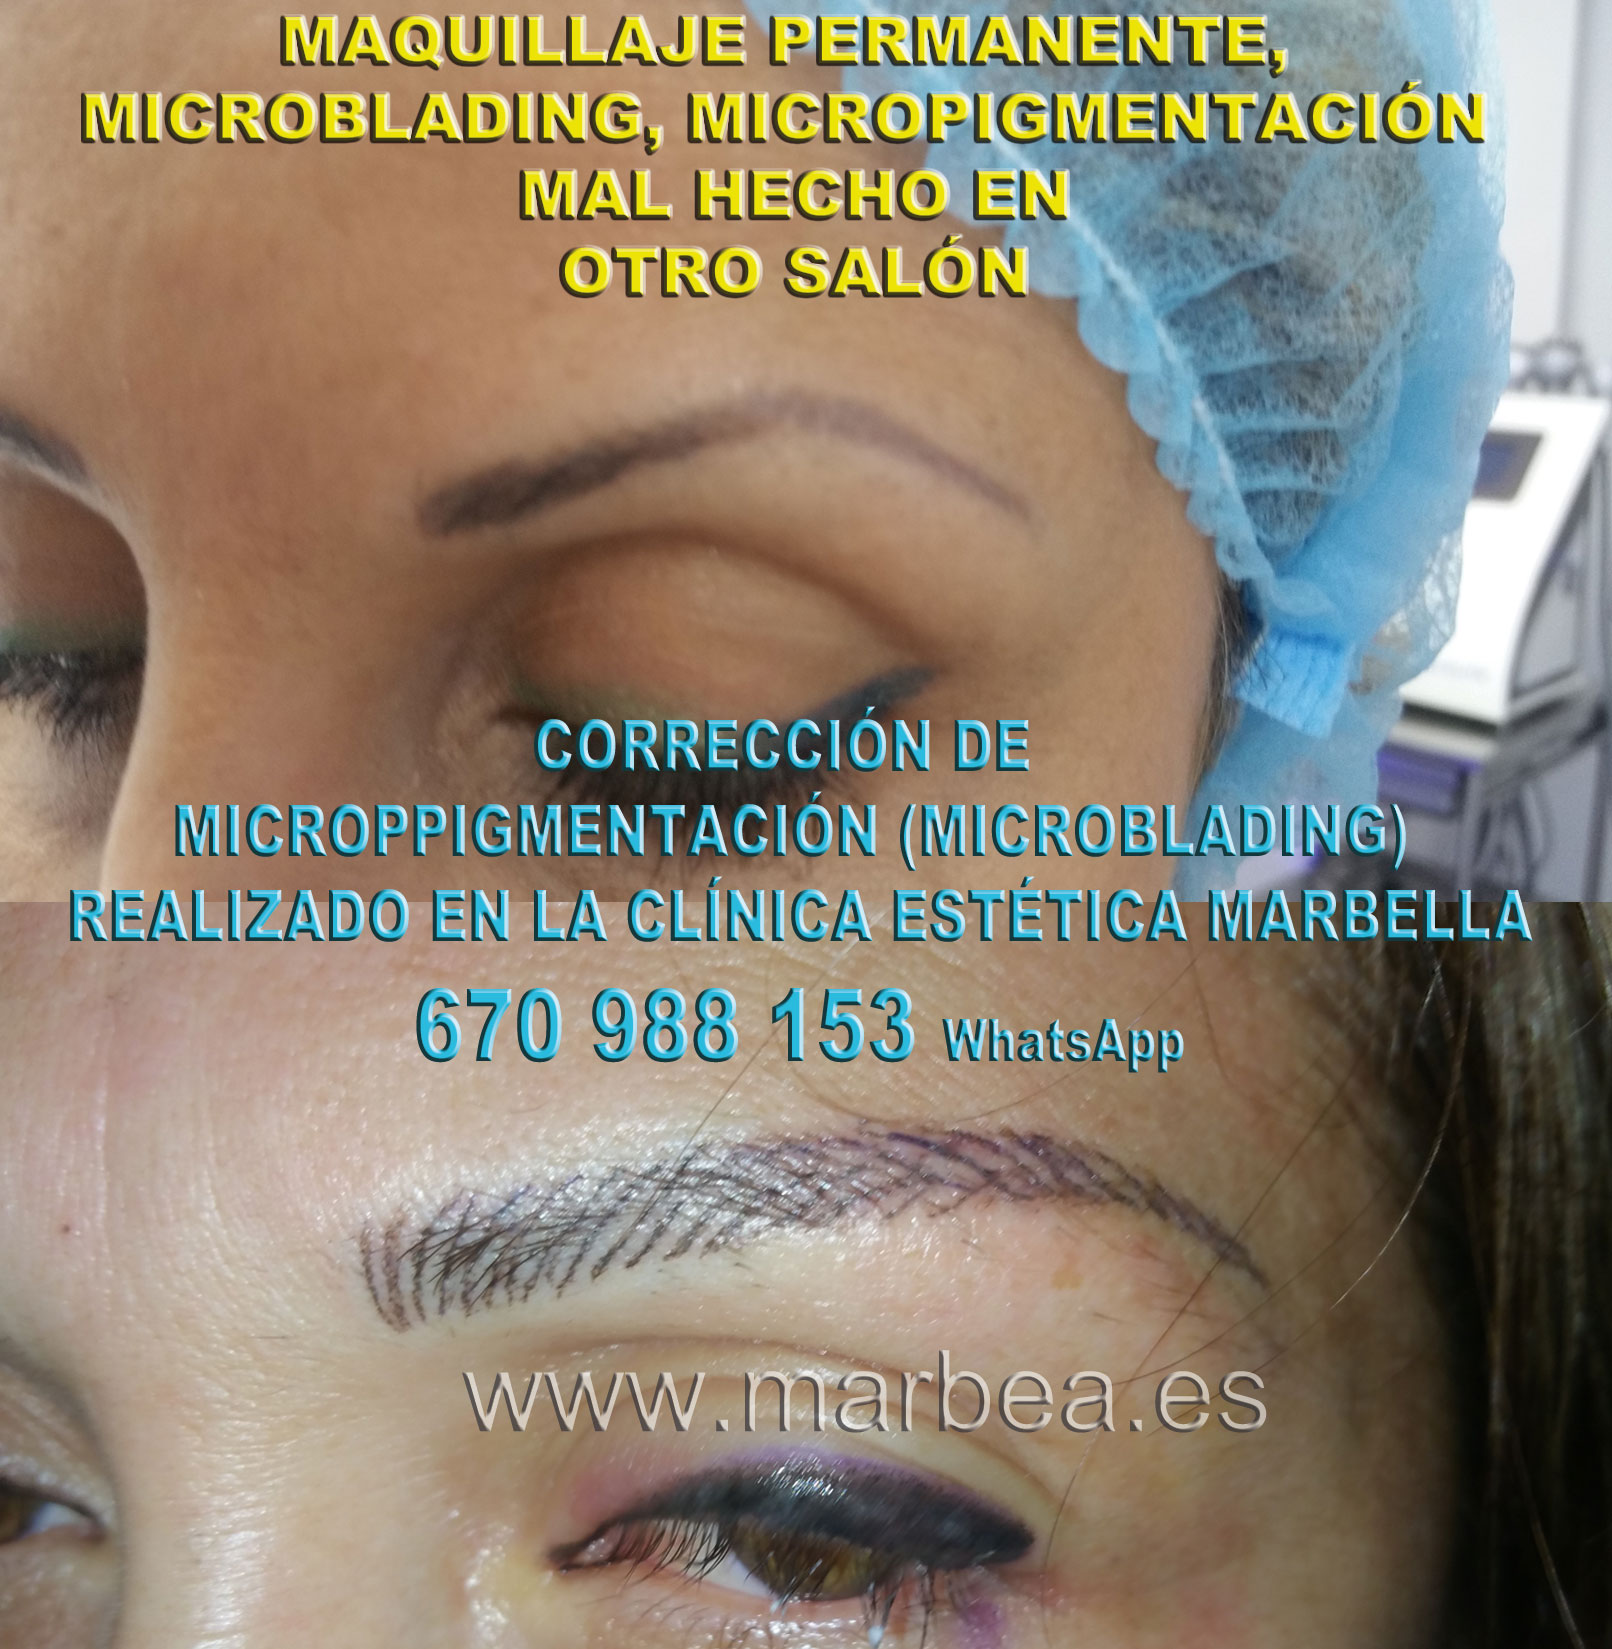 CORREGIR MICROPIGMENTACION MAL HECHA clínica estética maquillaje permanete propone como aclarar la micropigmentación cejas,corregir micropigmentación mal hecha